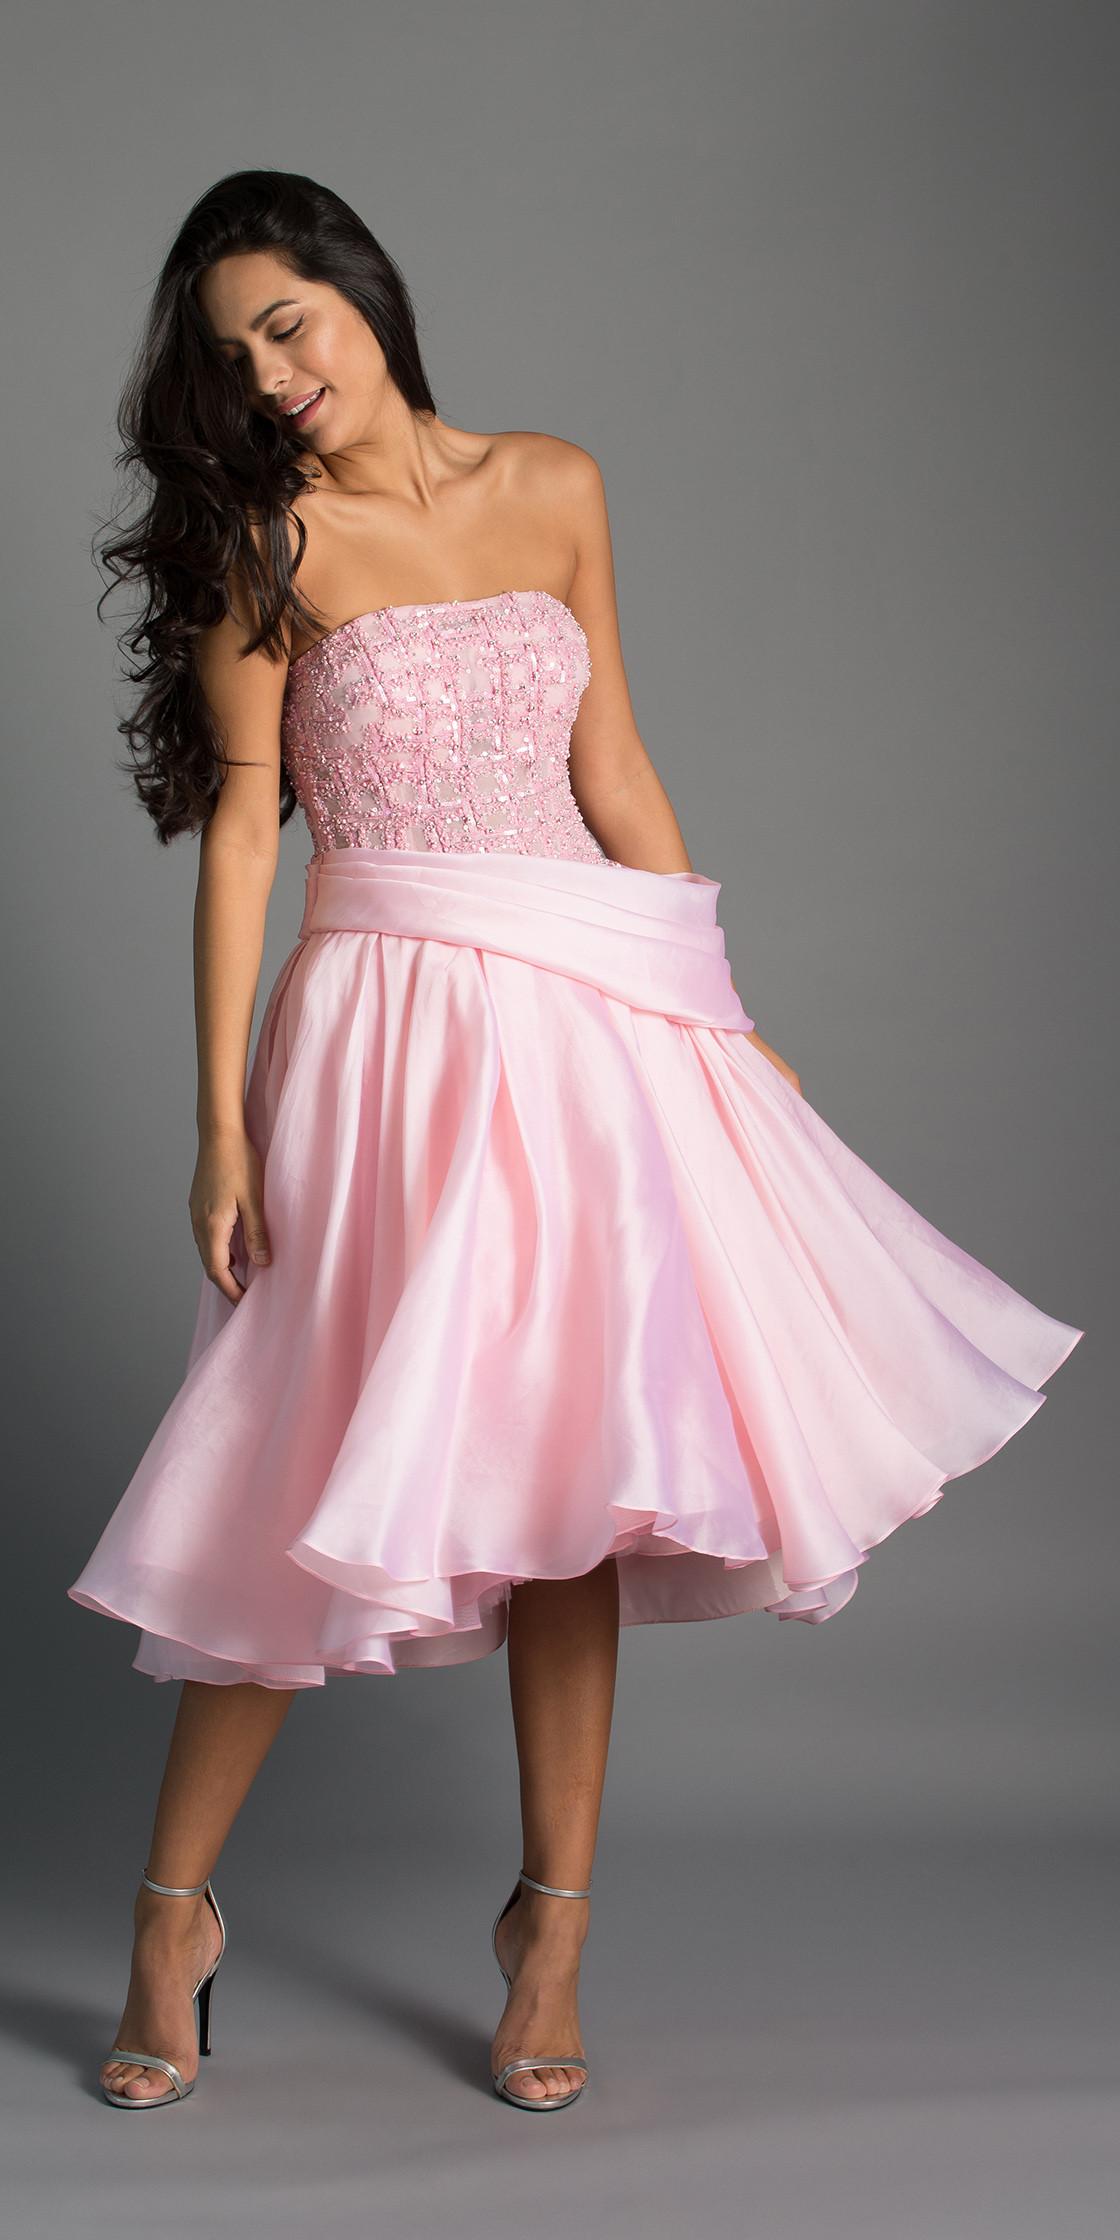 Maison Elegance  Strapless A-Line Dress